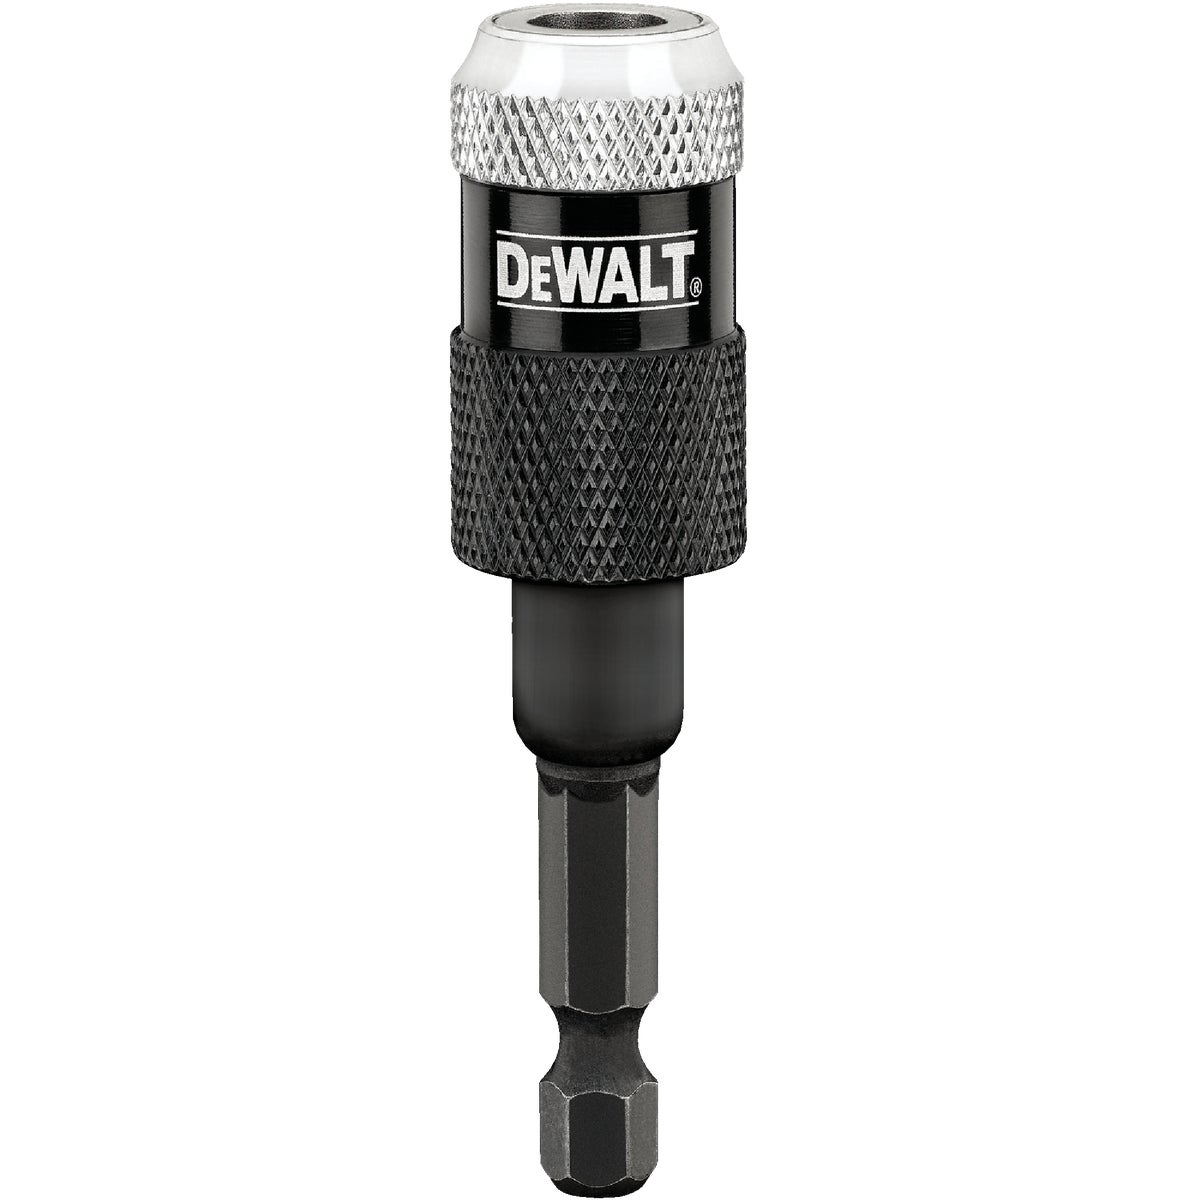 DeWalt Impact Ready Rapid Load Bit Holder, DWA2509